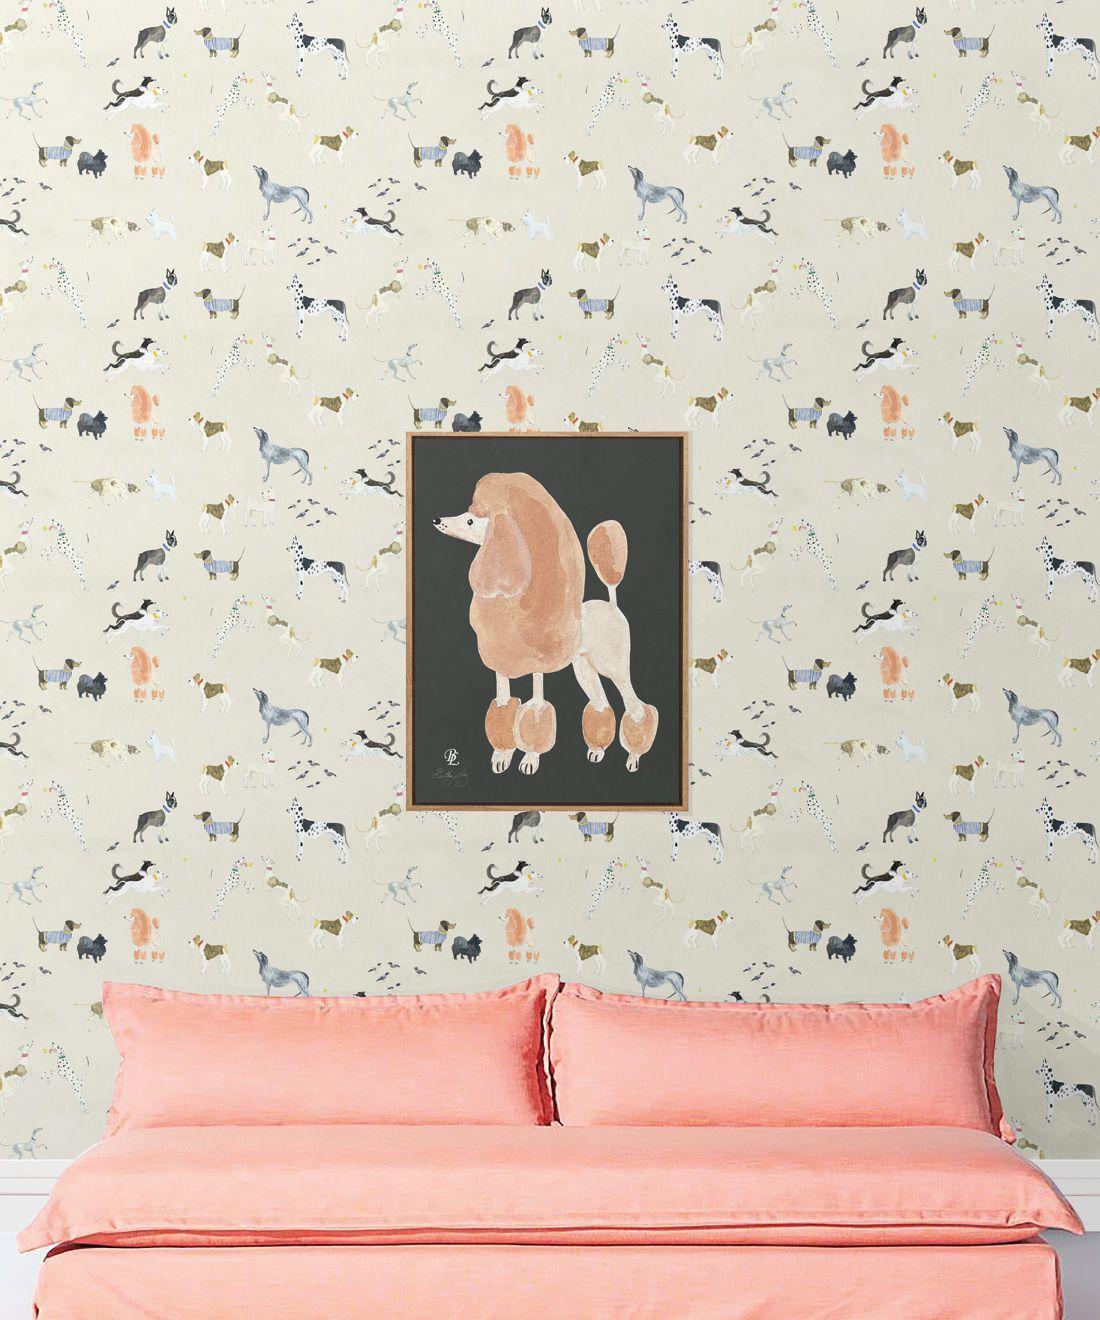 Doggies Wallpaper •Dog Wallpaper •Cream • Insitu with salmon colored sofa